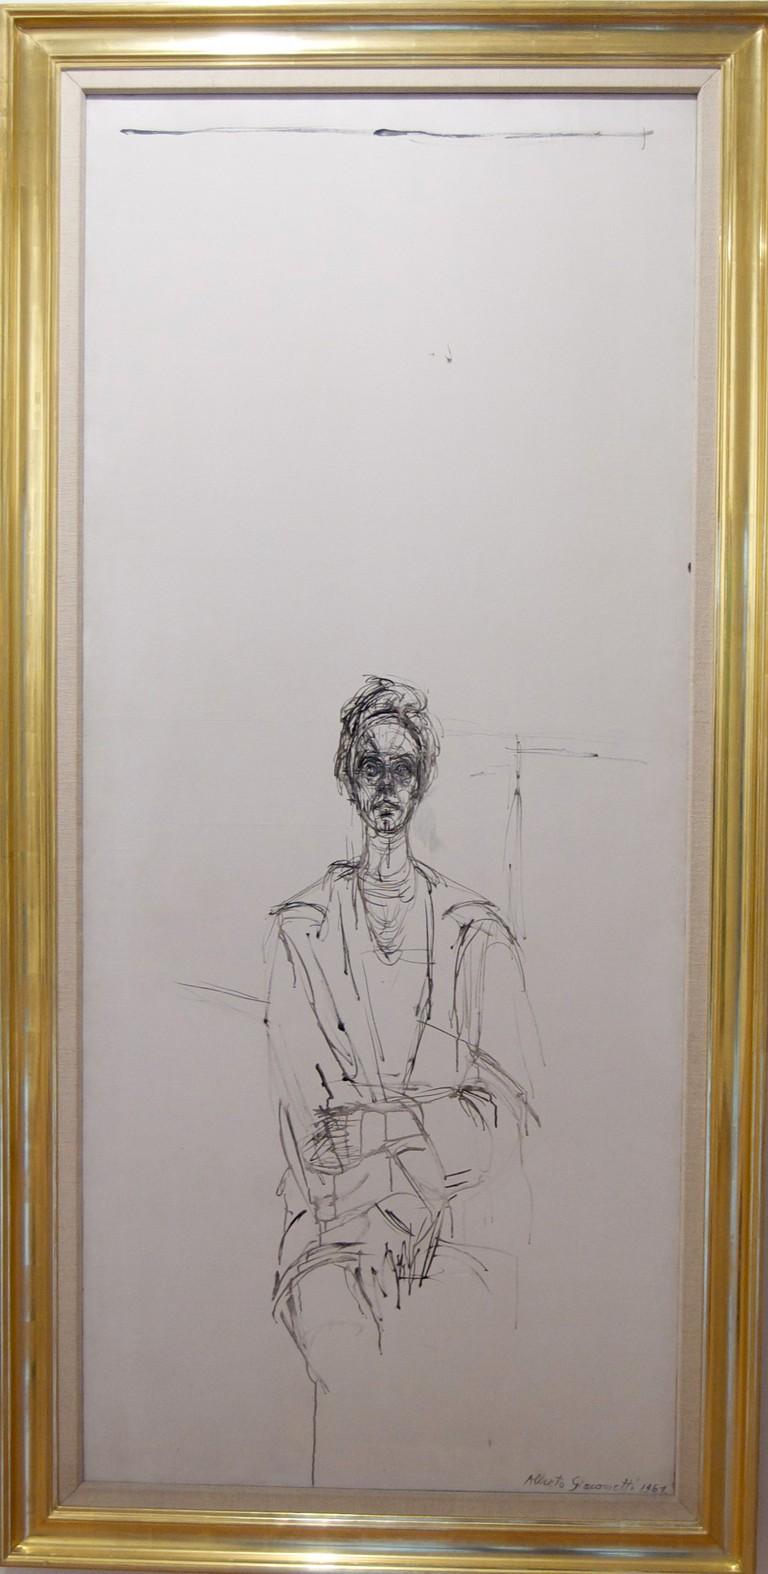 Alberto Giamotti, 'Carolina Sobre Fondo Blanco', 1961